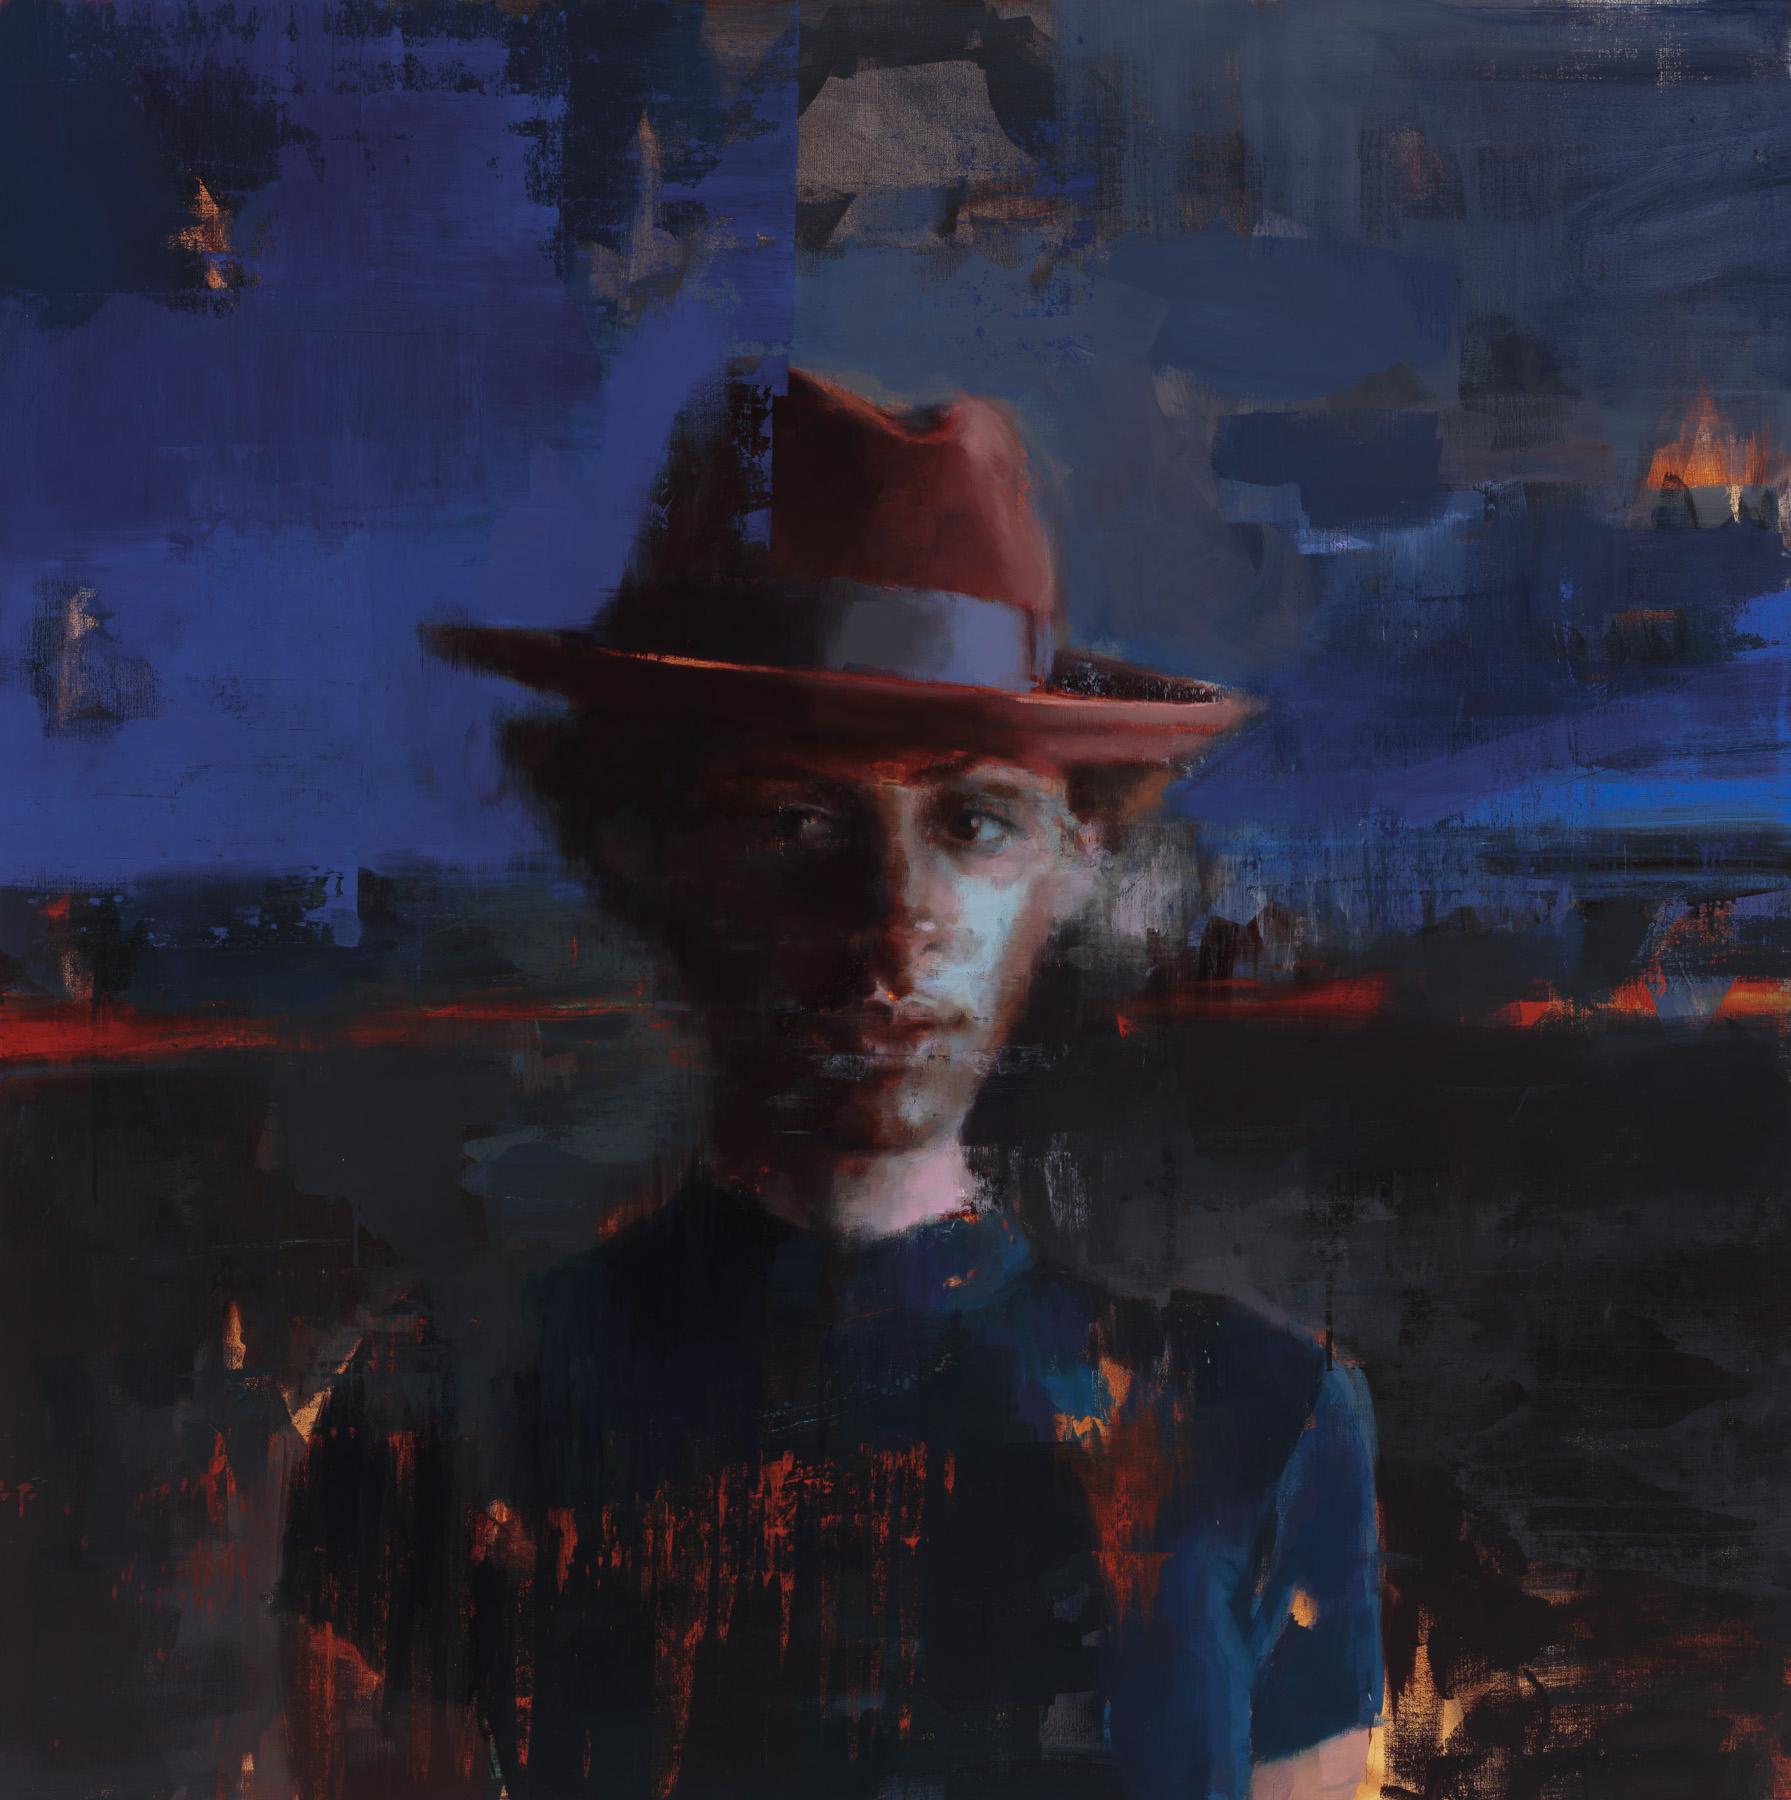 """ Delphine Somewhere""  2018, 59"" x 59"" (150 x 150 cm), oil on linen."